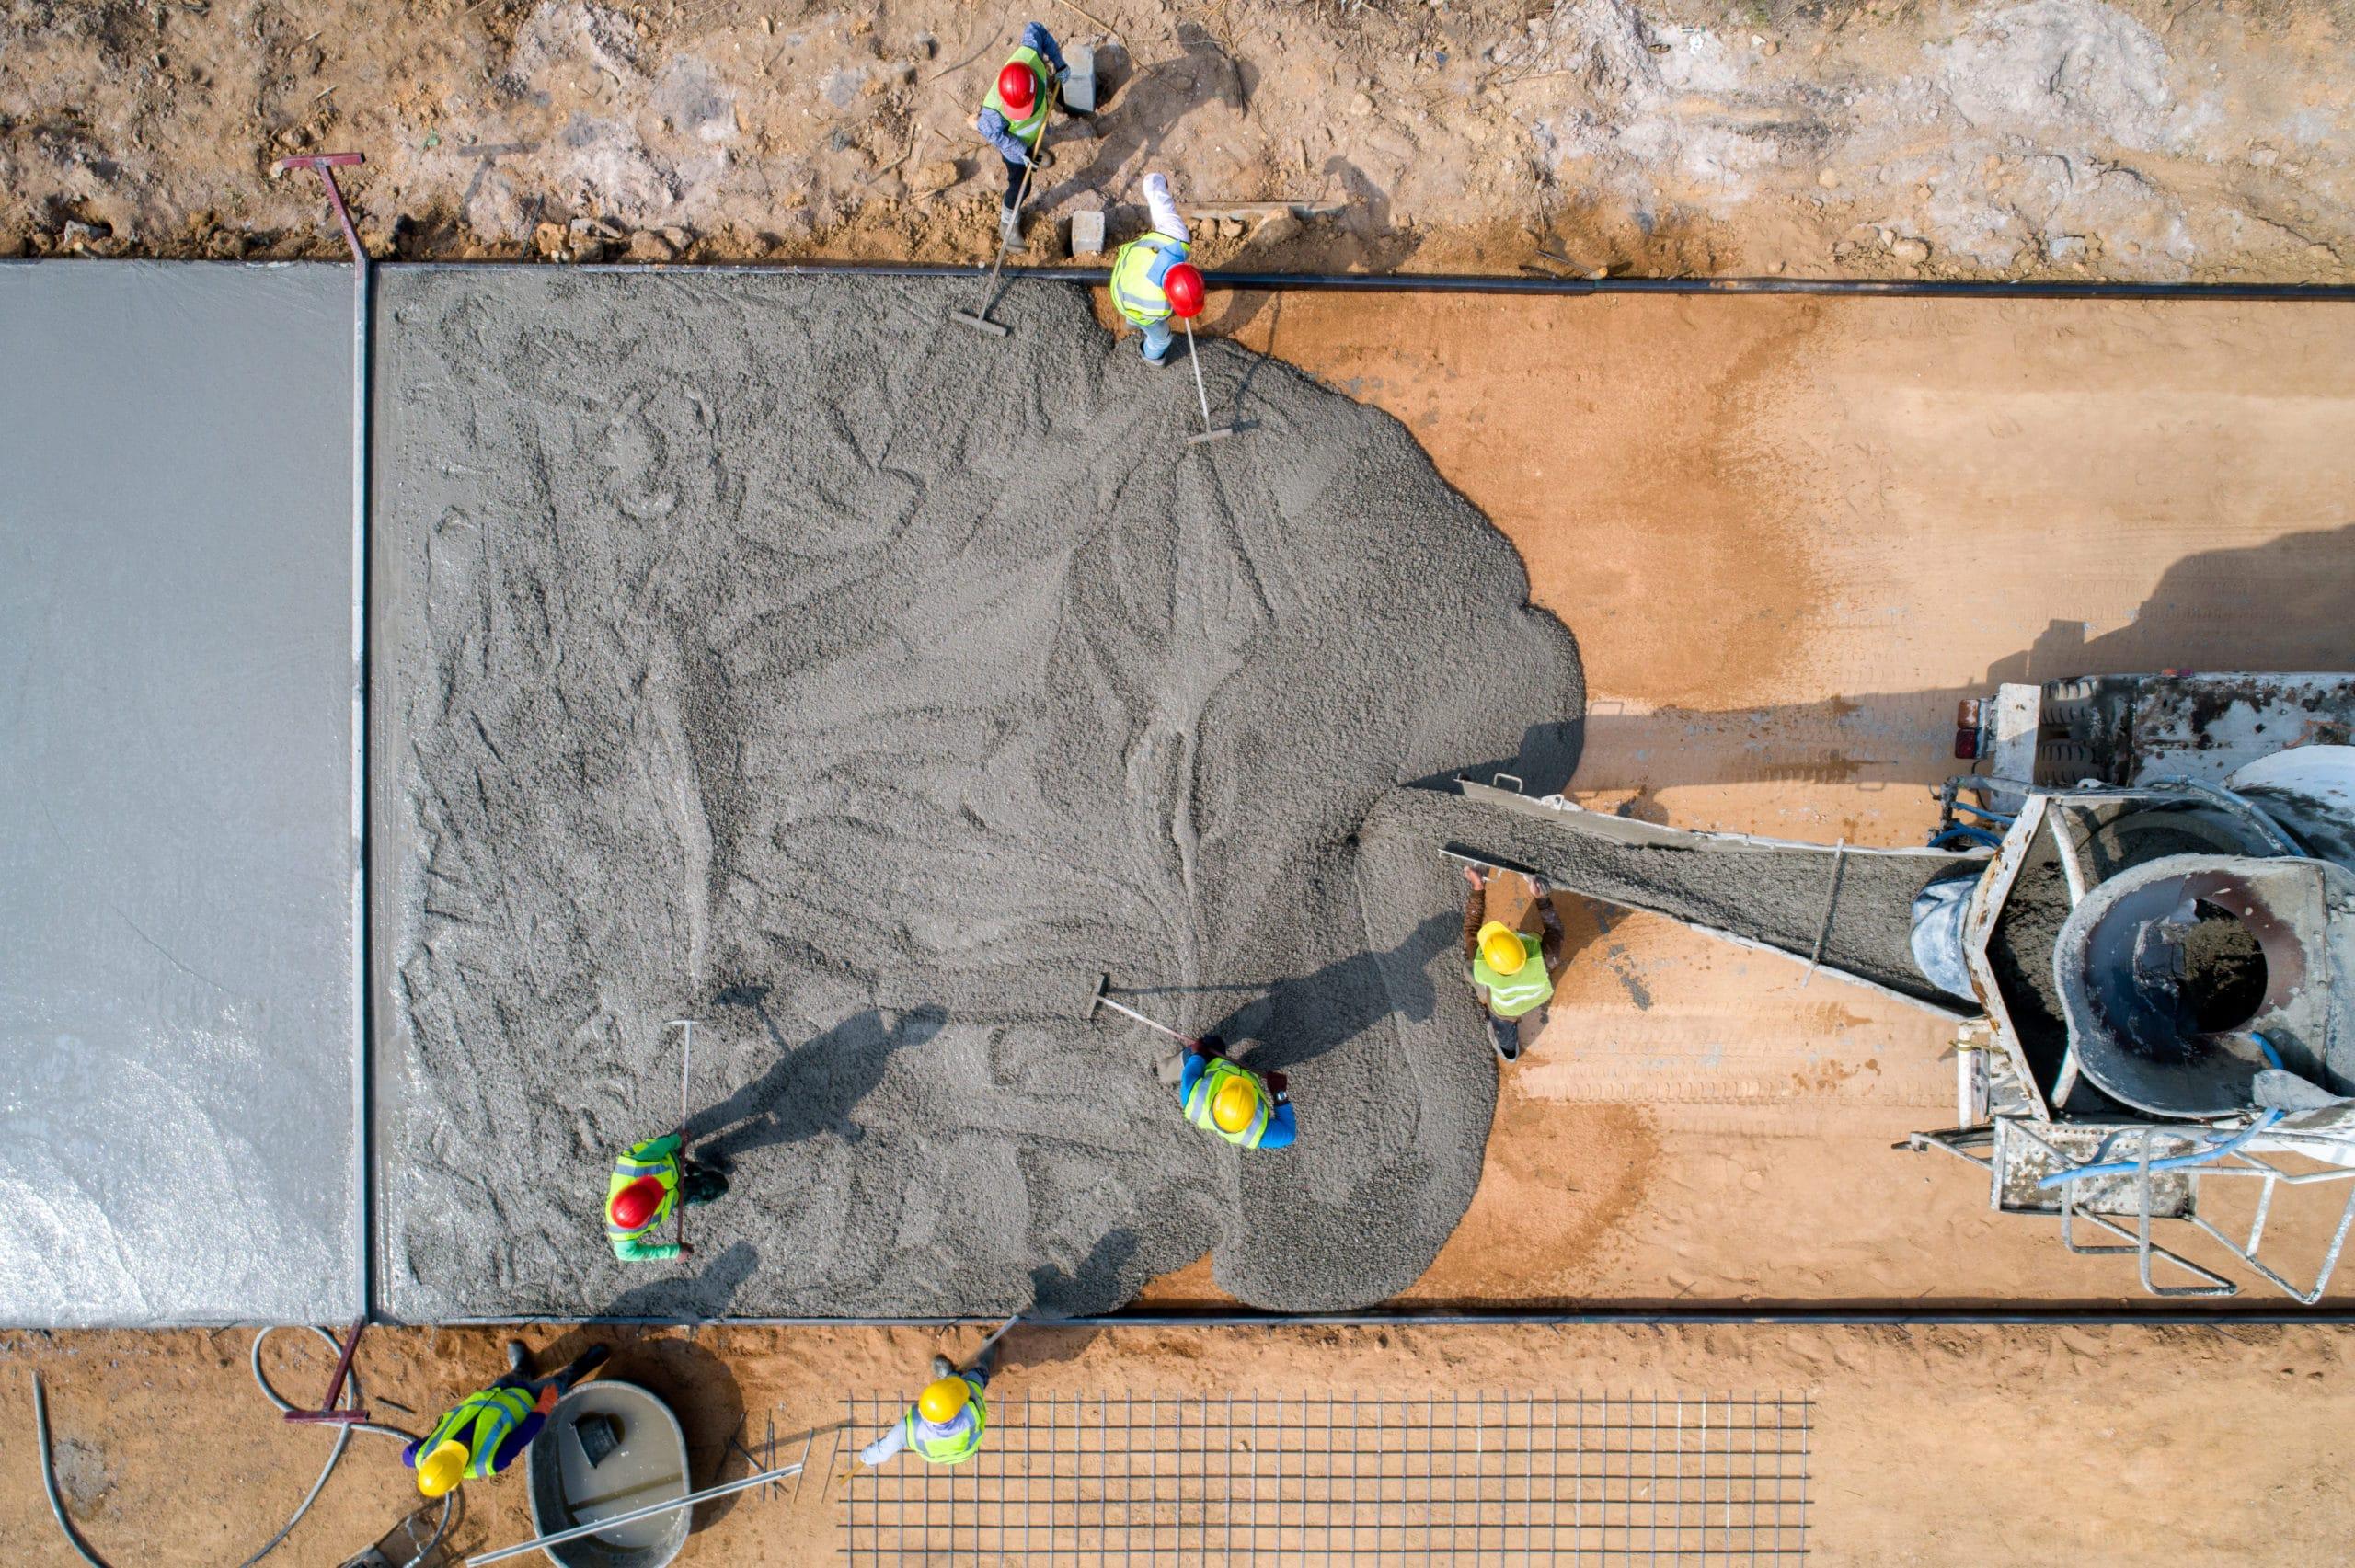 A construction worker pouring a wet concret at road construction site